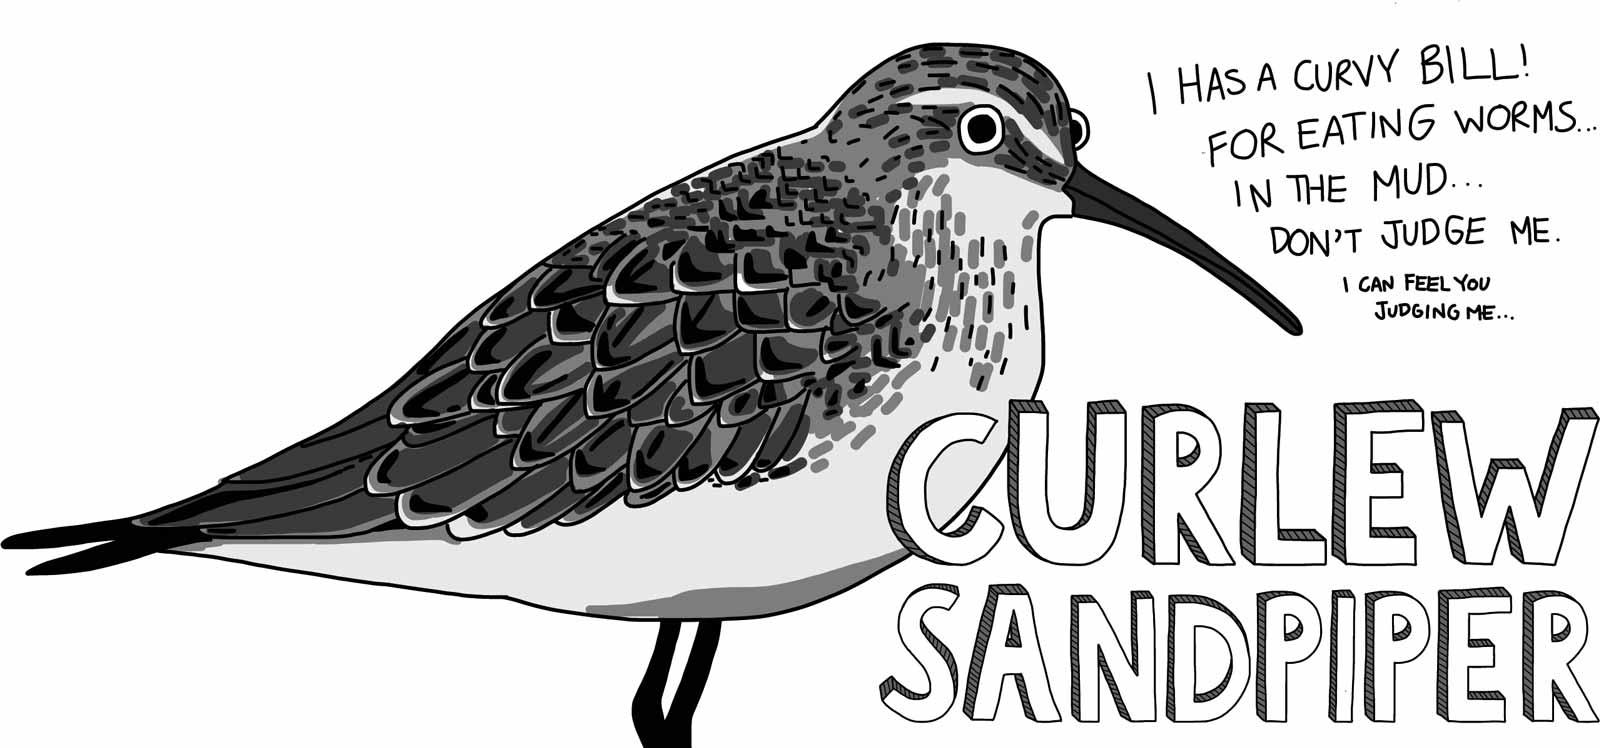 Cartoon of a curlew sandpiper